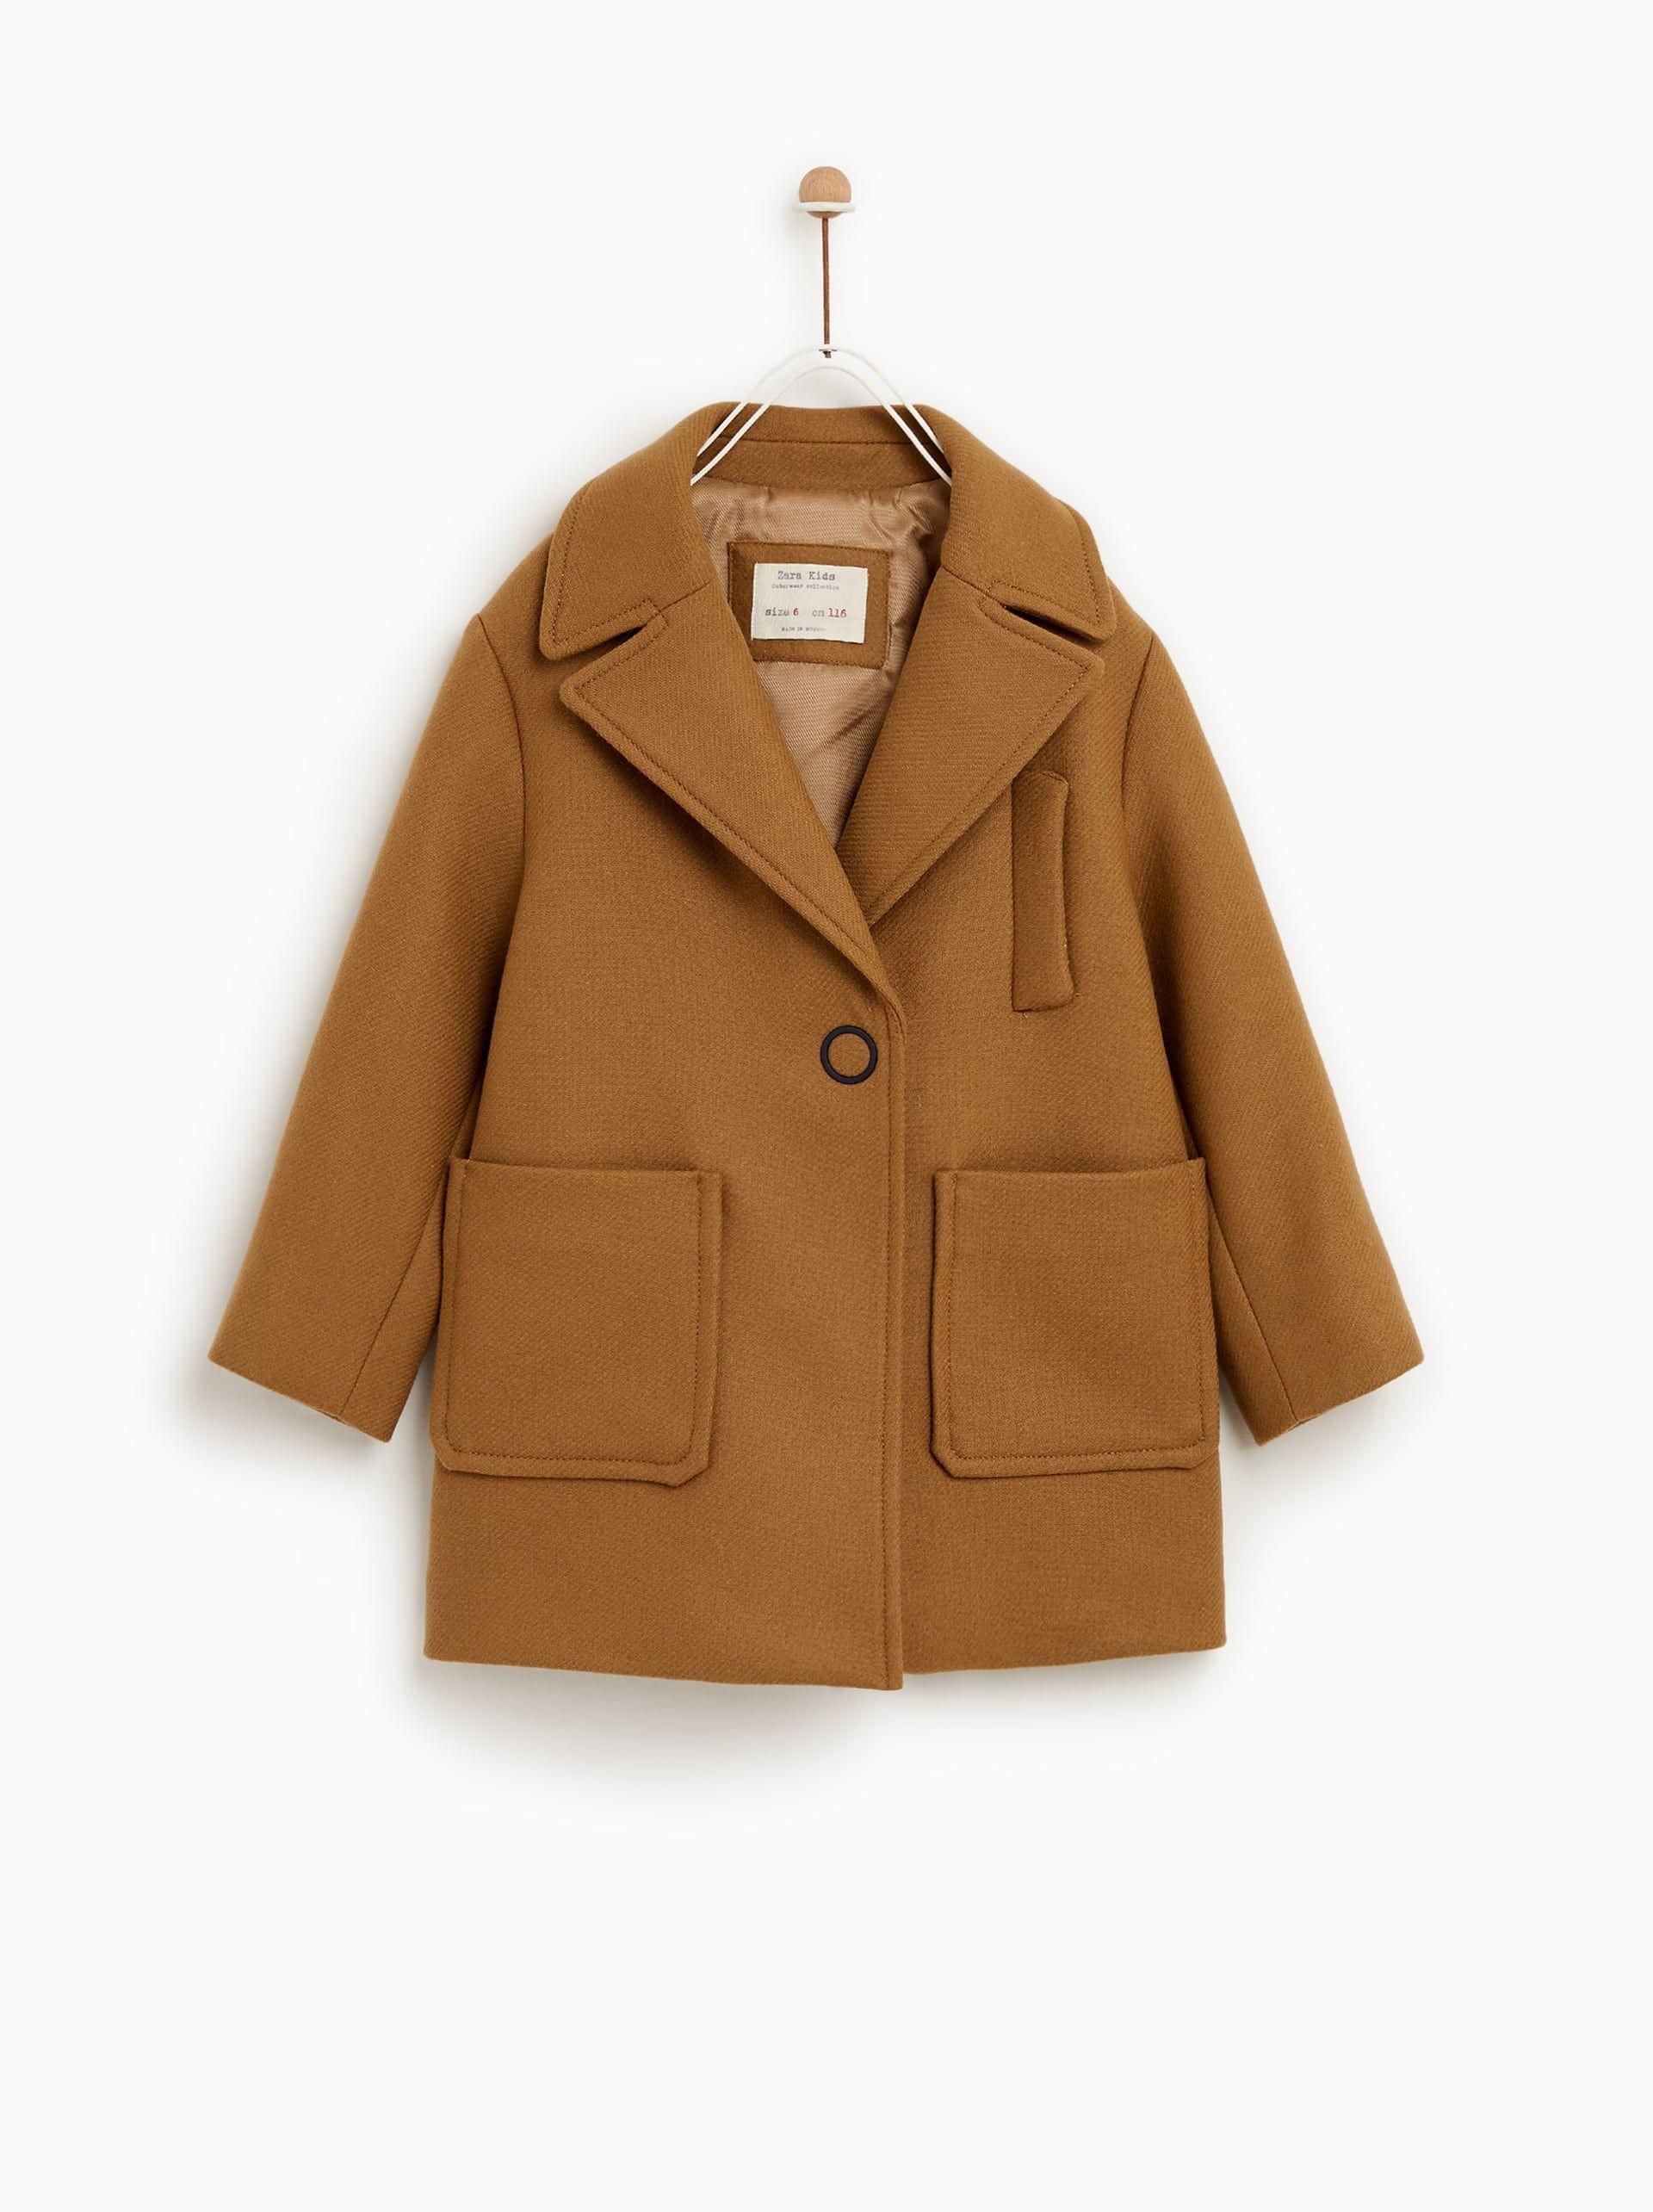 top-rated cheap popular style on wholesale LAPEL COAT from Zara | Girls | Zara kids, Coat, Zara baby